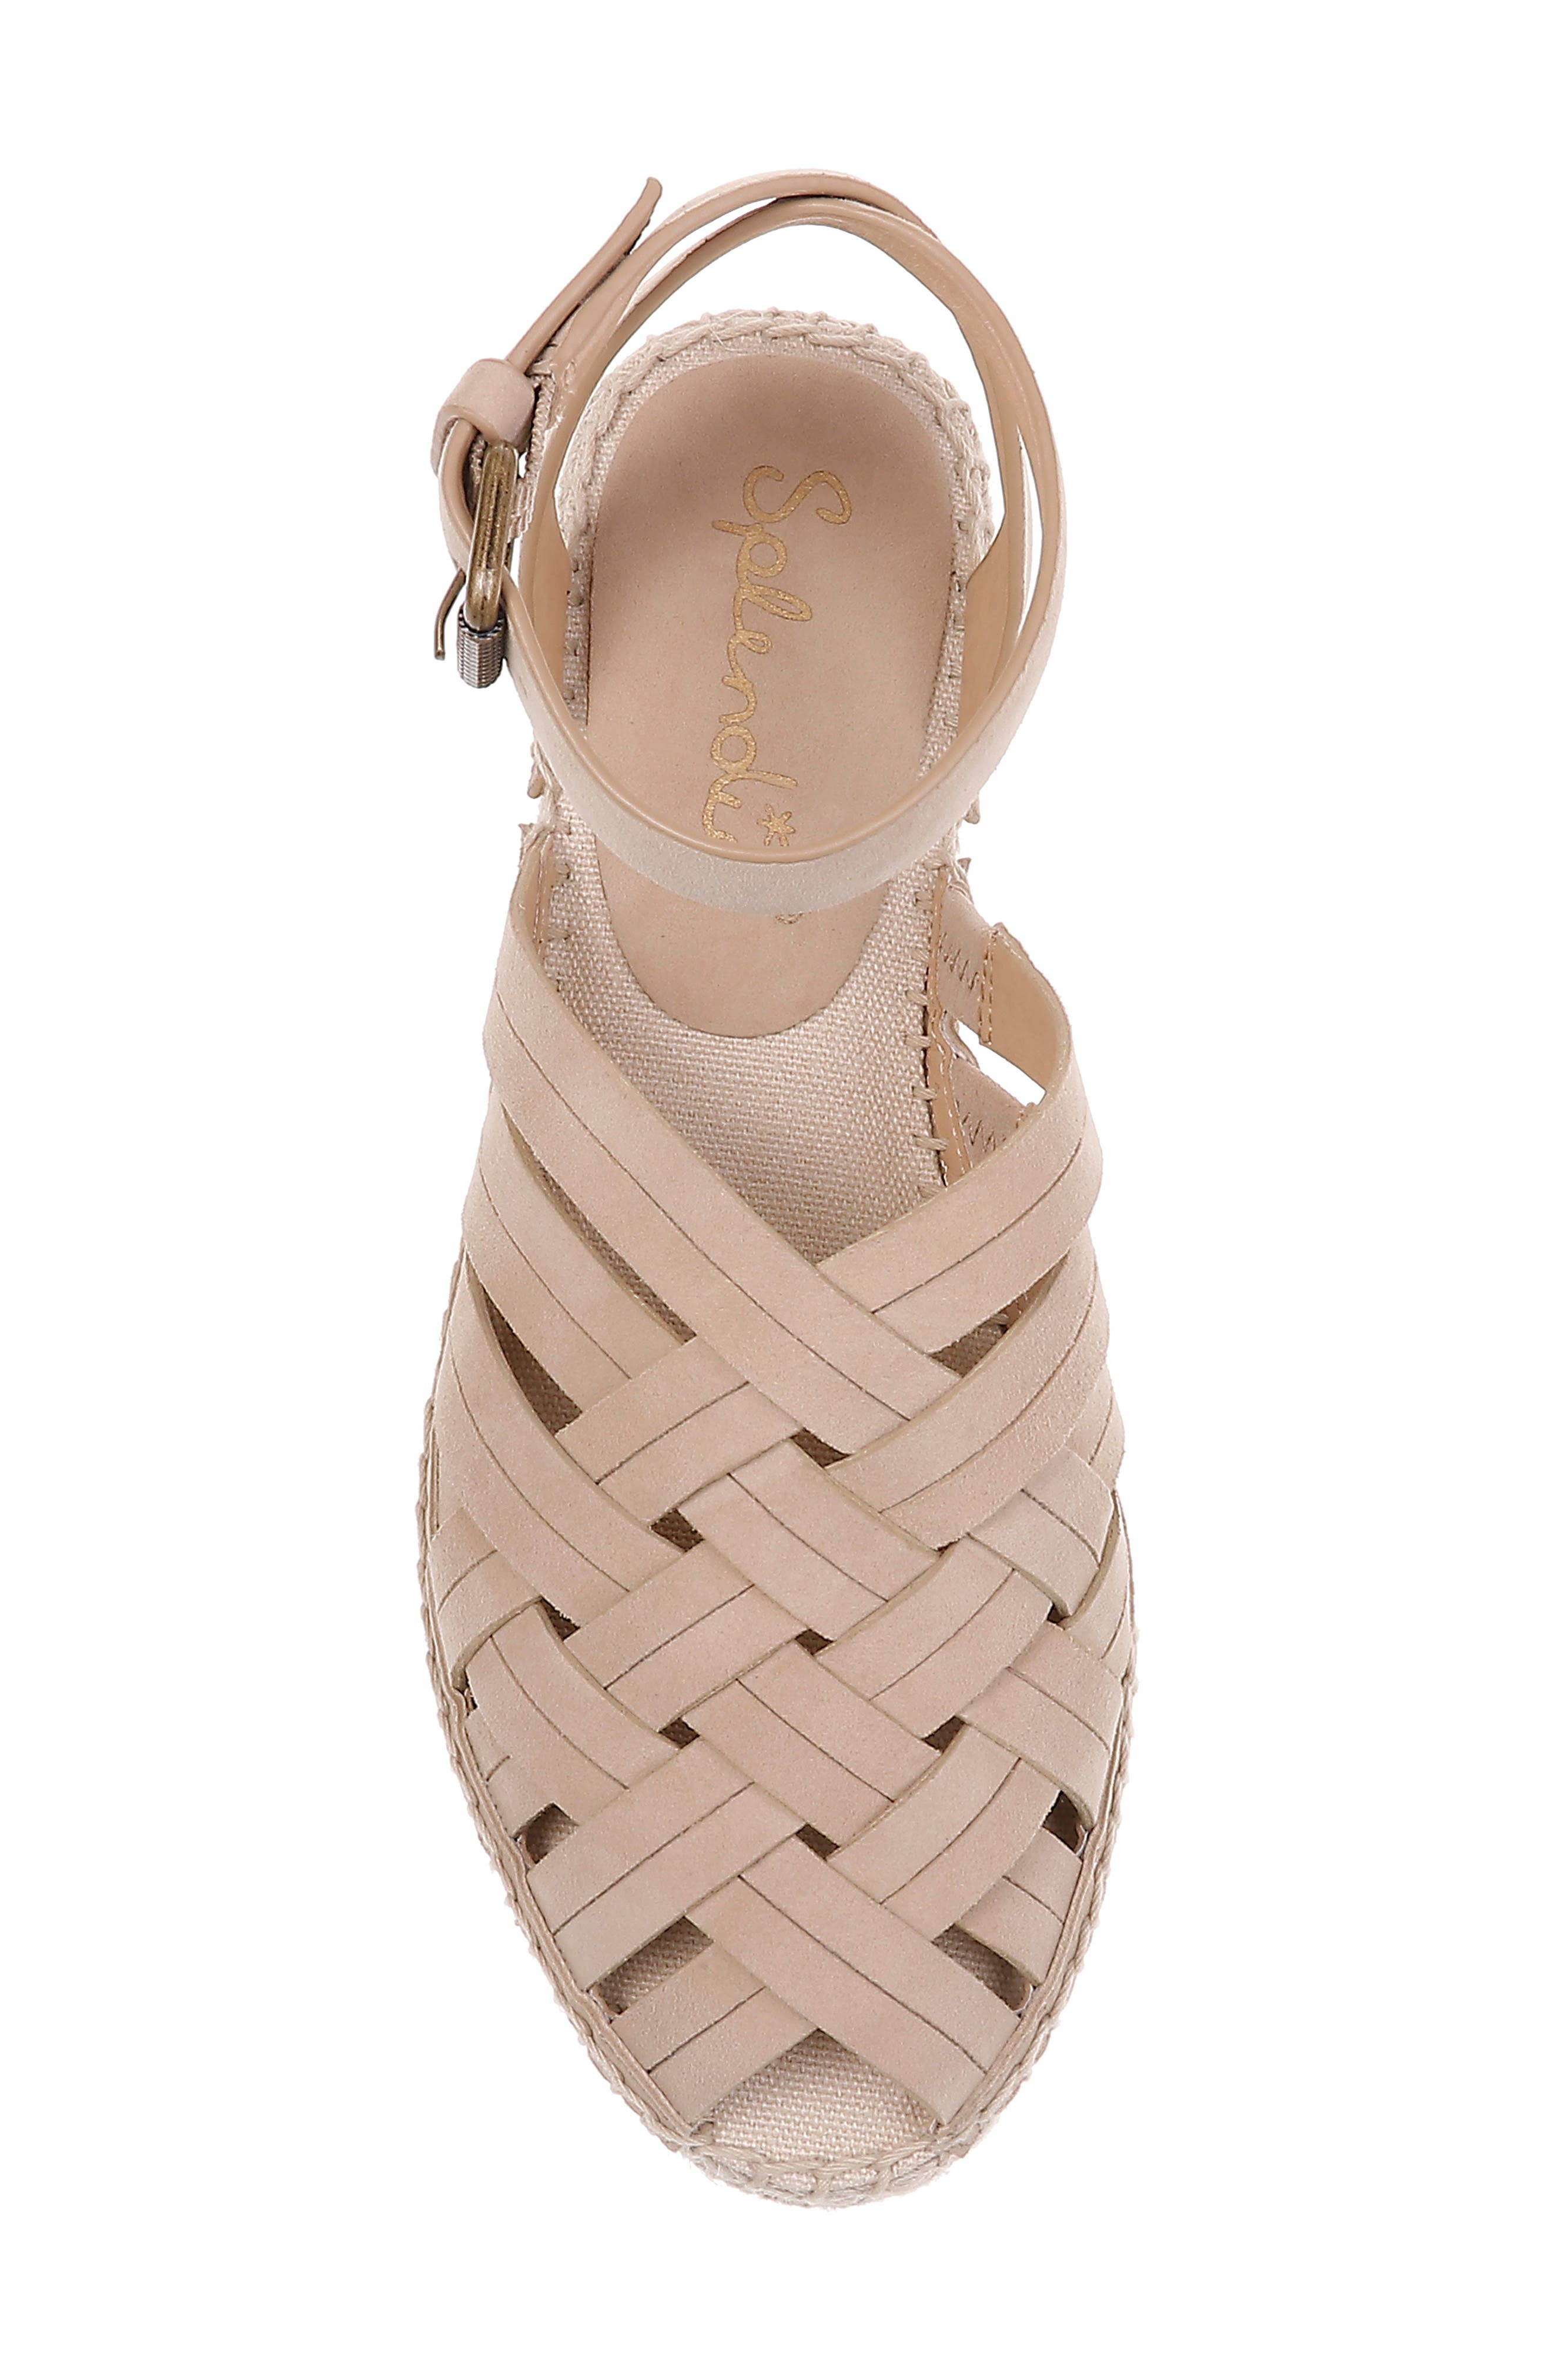 SPLENDID, Sheryl Espadrille Ankle Strap Sandal, Alternate thumbnail 5, color, MUSHROOM SUEDE